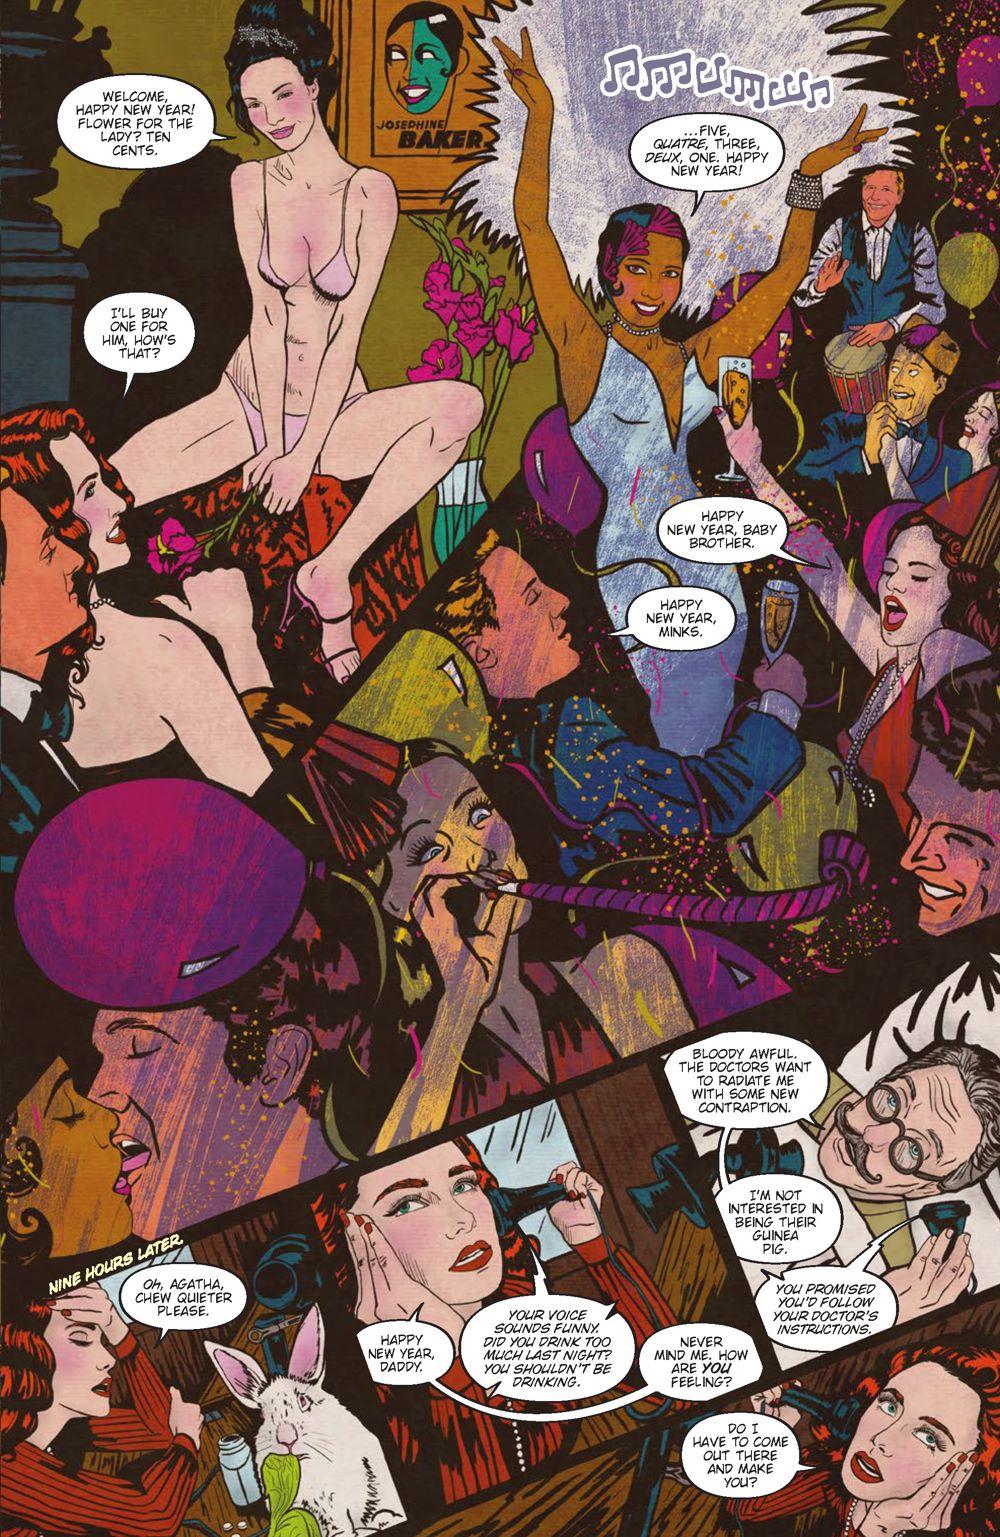 Minky-Interiors-Page_2 ComicList Previews: MINKY WOODCOCK THE GIRL WHO ELECTRIFIED TESLA #1